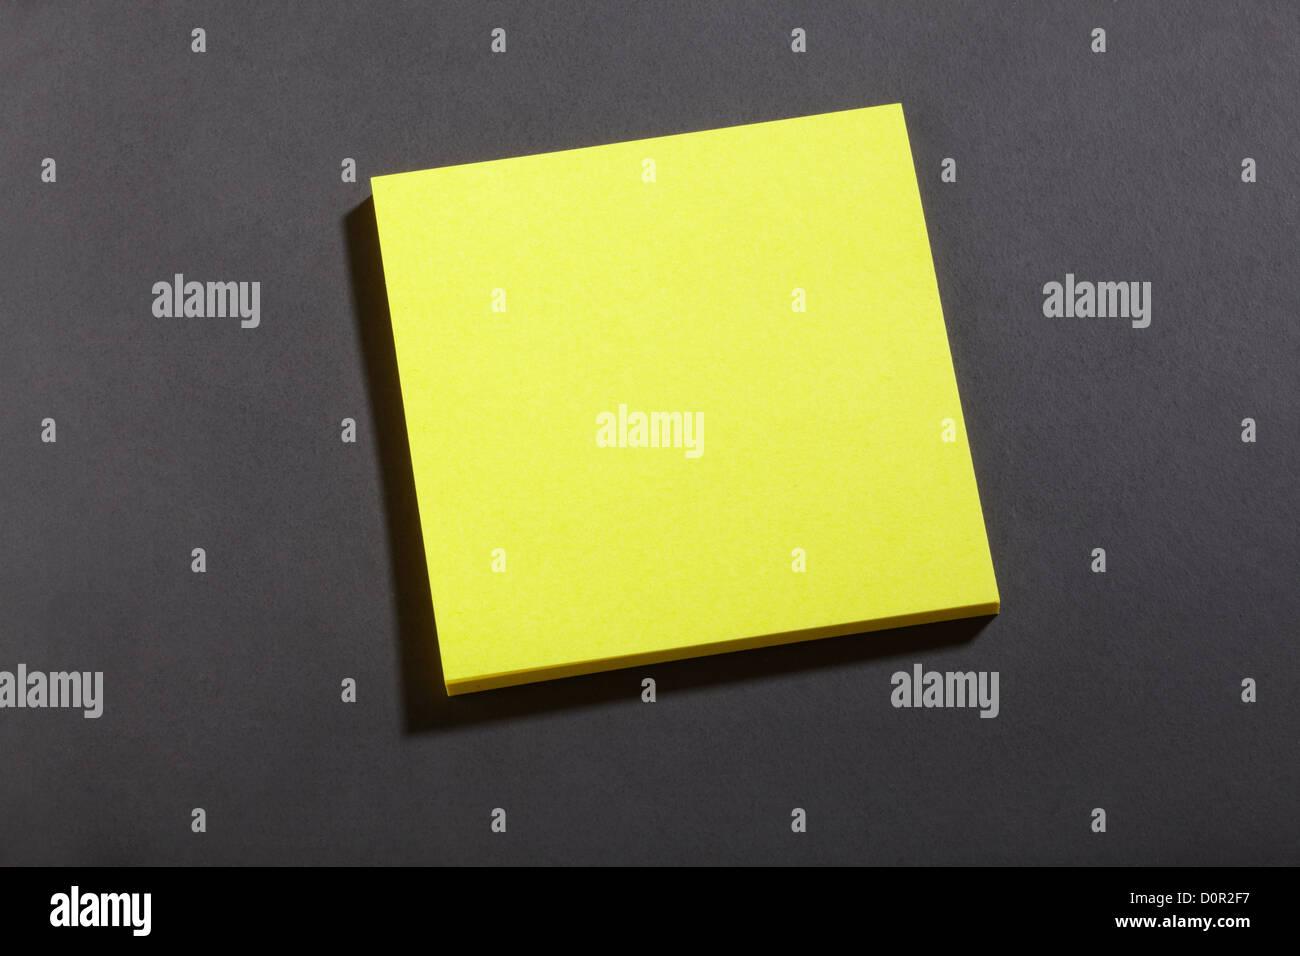 Yellow sticker note on blackboard - Stock Image